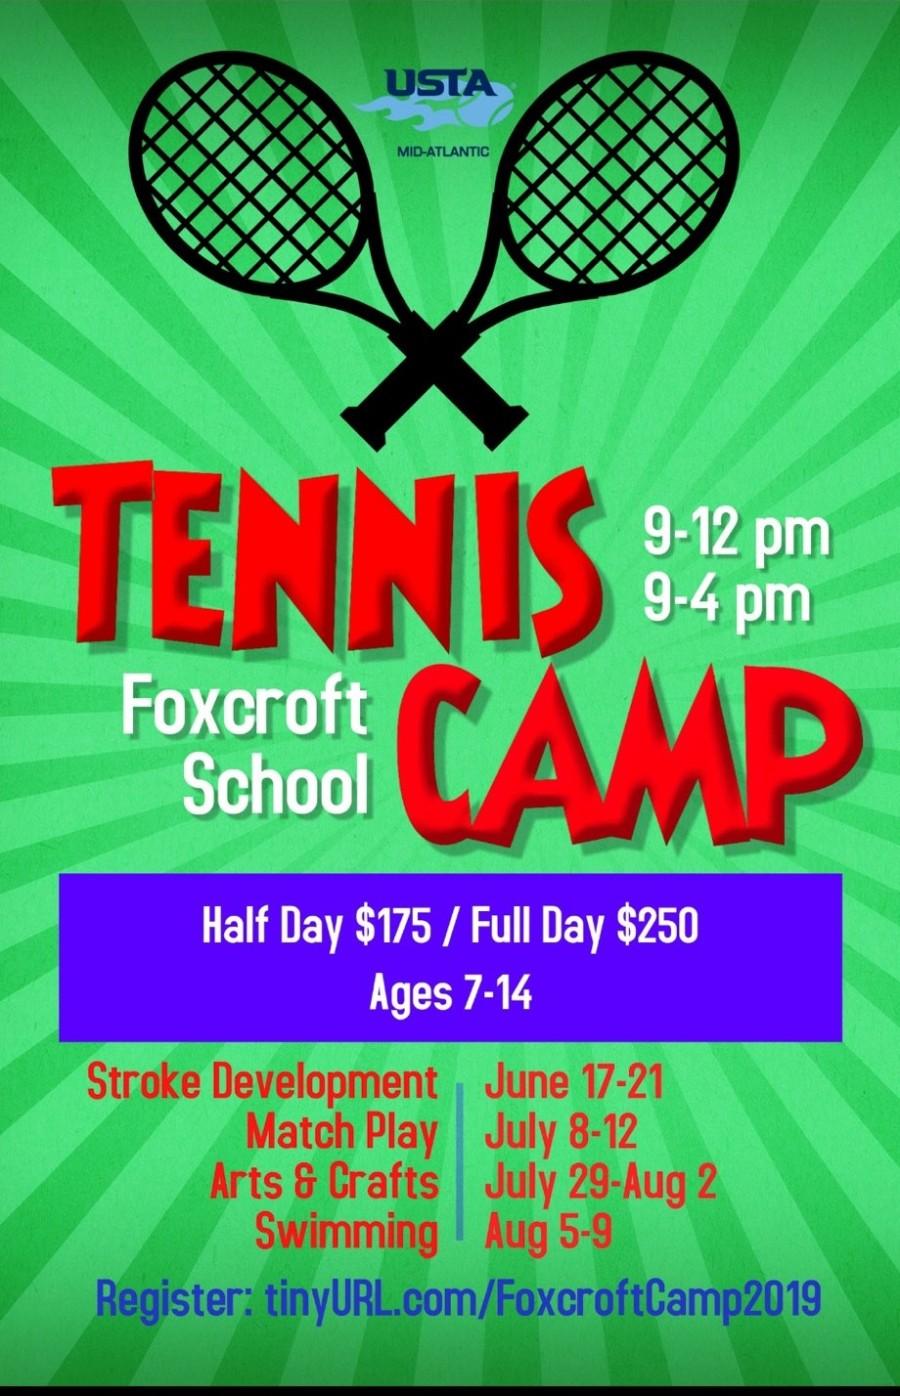 Foxcroft Tennis Camp